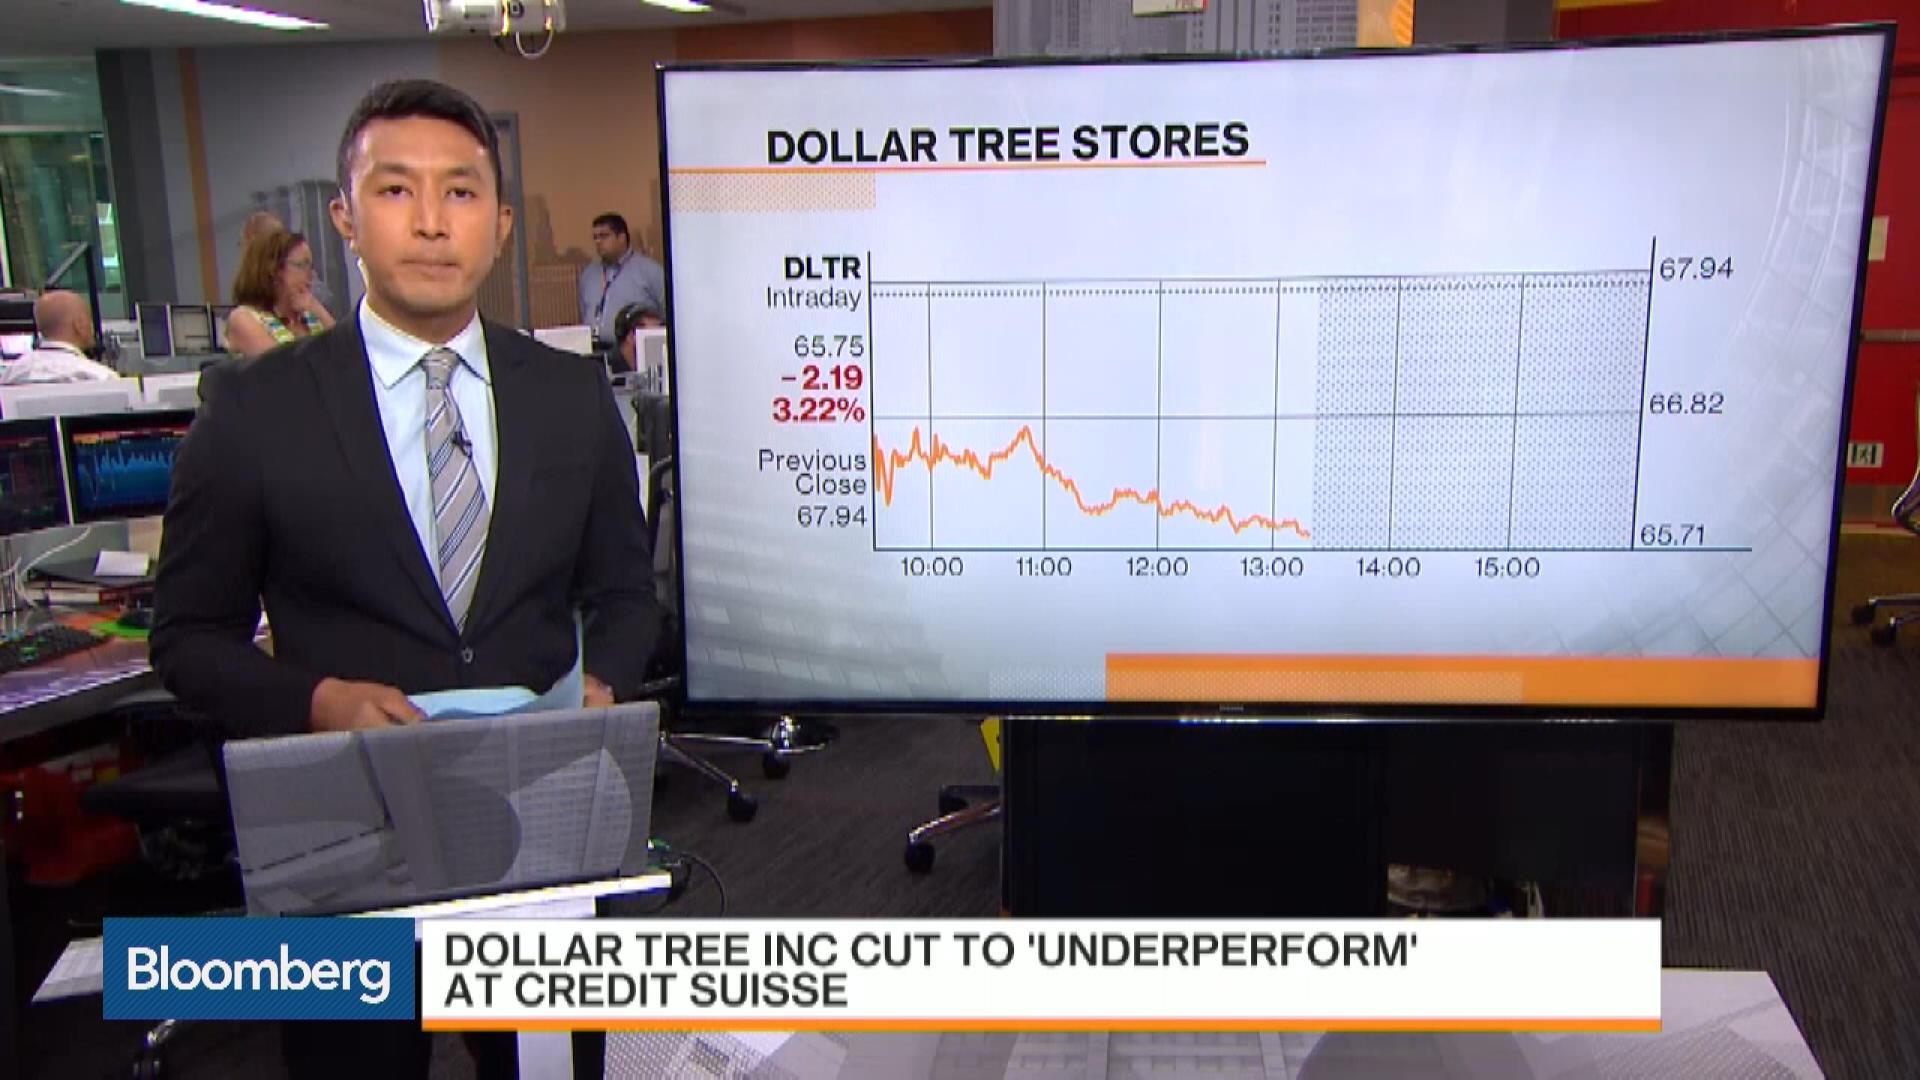 DLTR:NASDAQ GS Stock Quote - Dollar Tree Inc - Bloomberg Markets